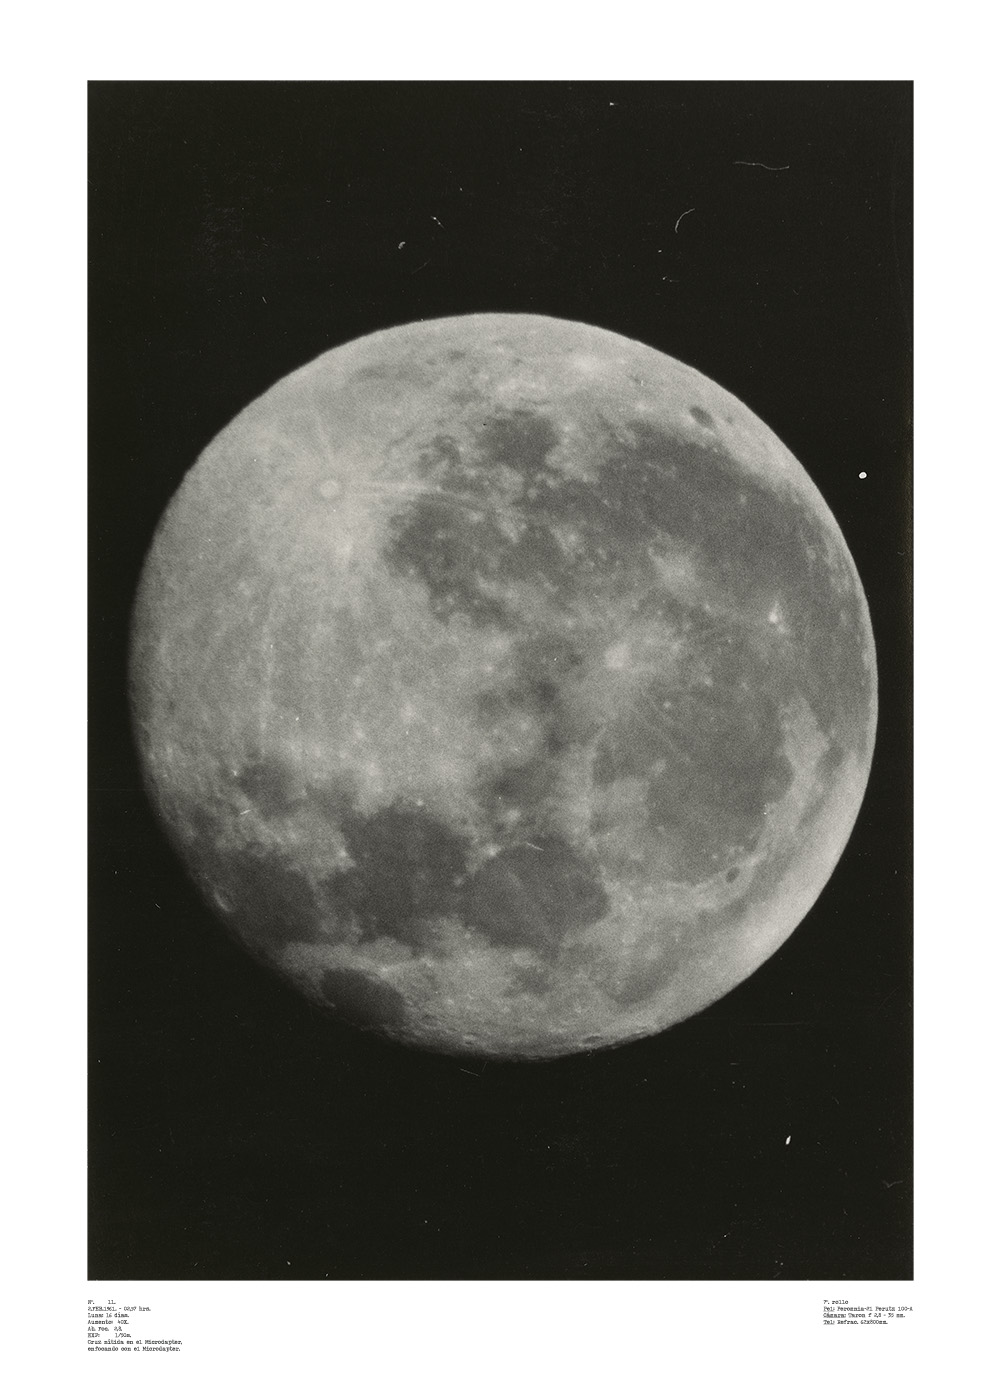 moon-n11-left-b-small.jpg